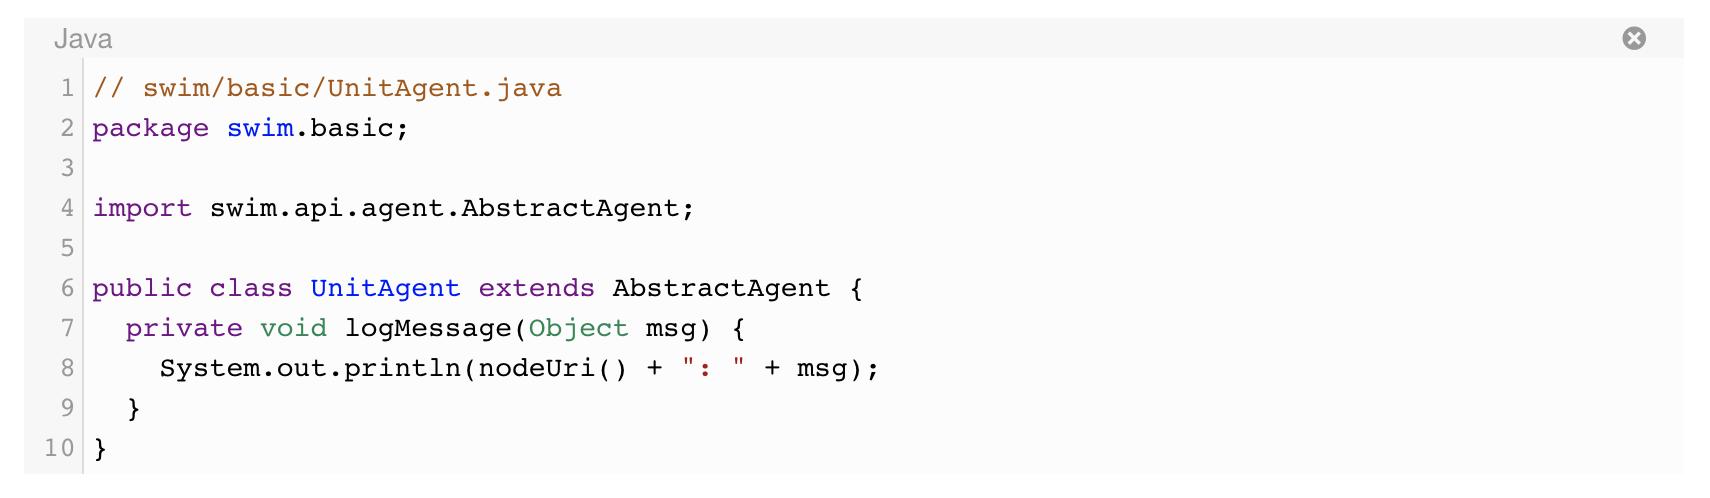 "// swim/basic/UnitAgent.java package swim.basic;  import swim.api.agent.AbstractAgent;  public class UnitAgent extends AbstractAgent {   private void logMessage(Object msg) {     System.out.println(nodeUri() + "": "" + msg);   } }"